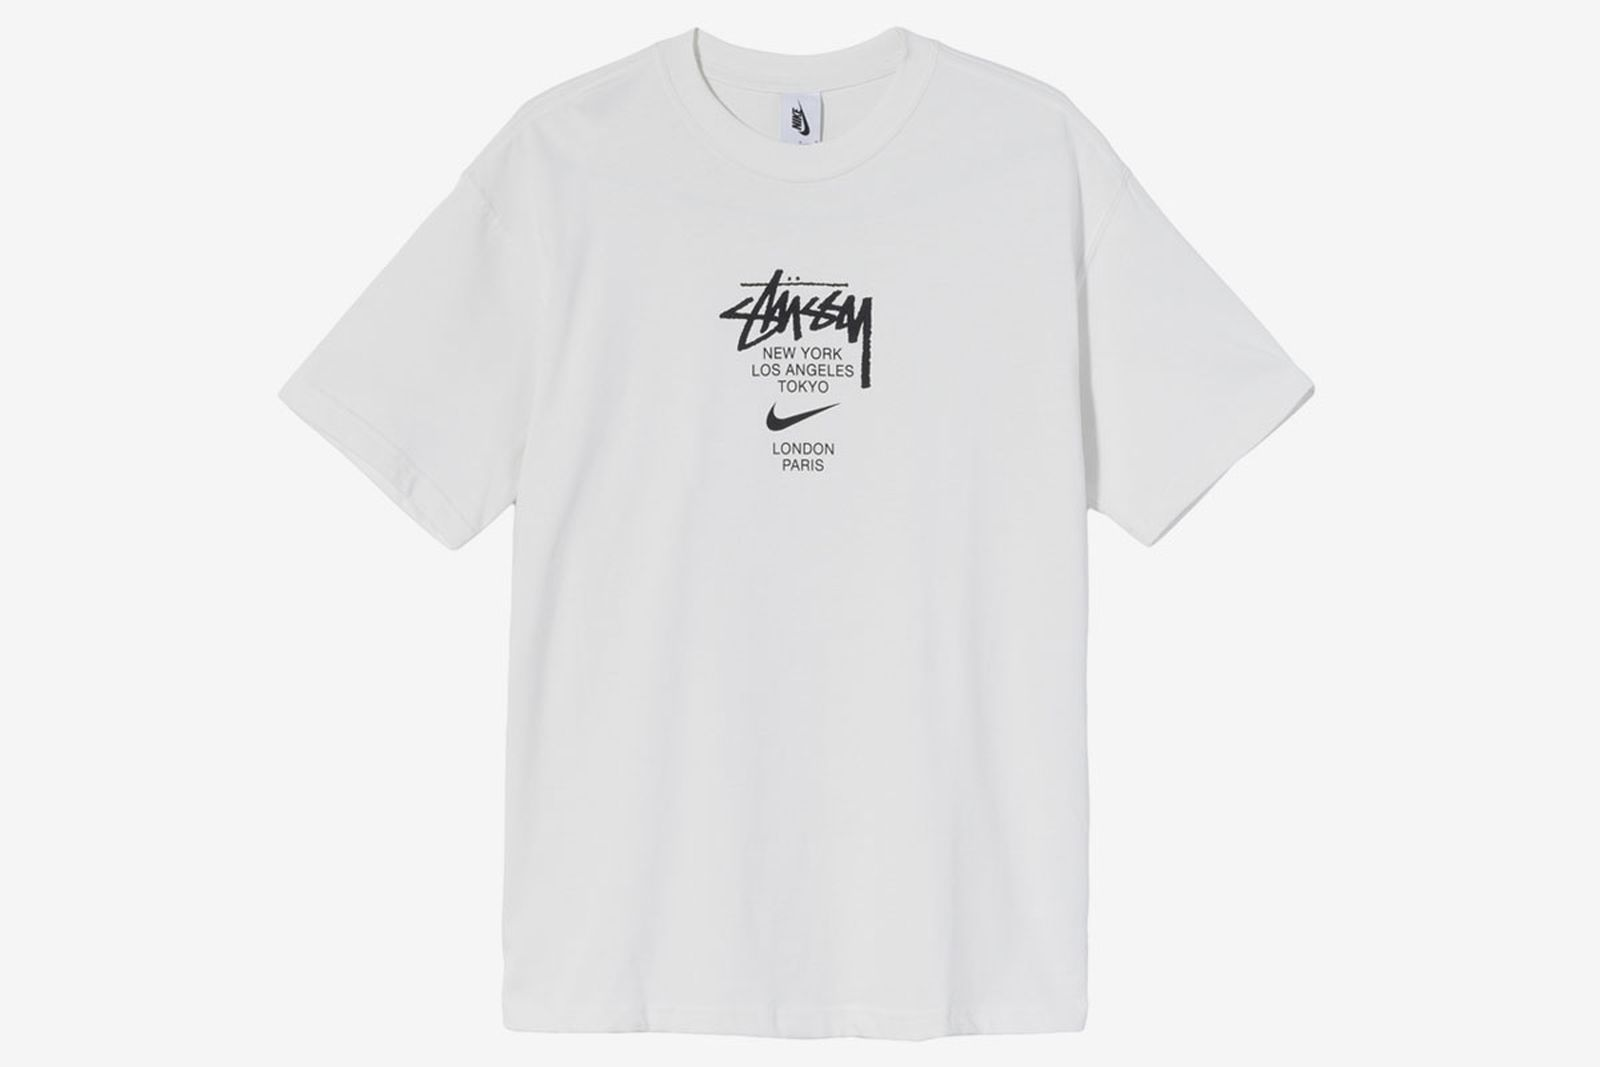 stussy-nike-air-force-1-apparel-010